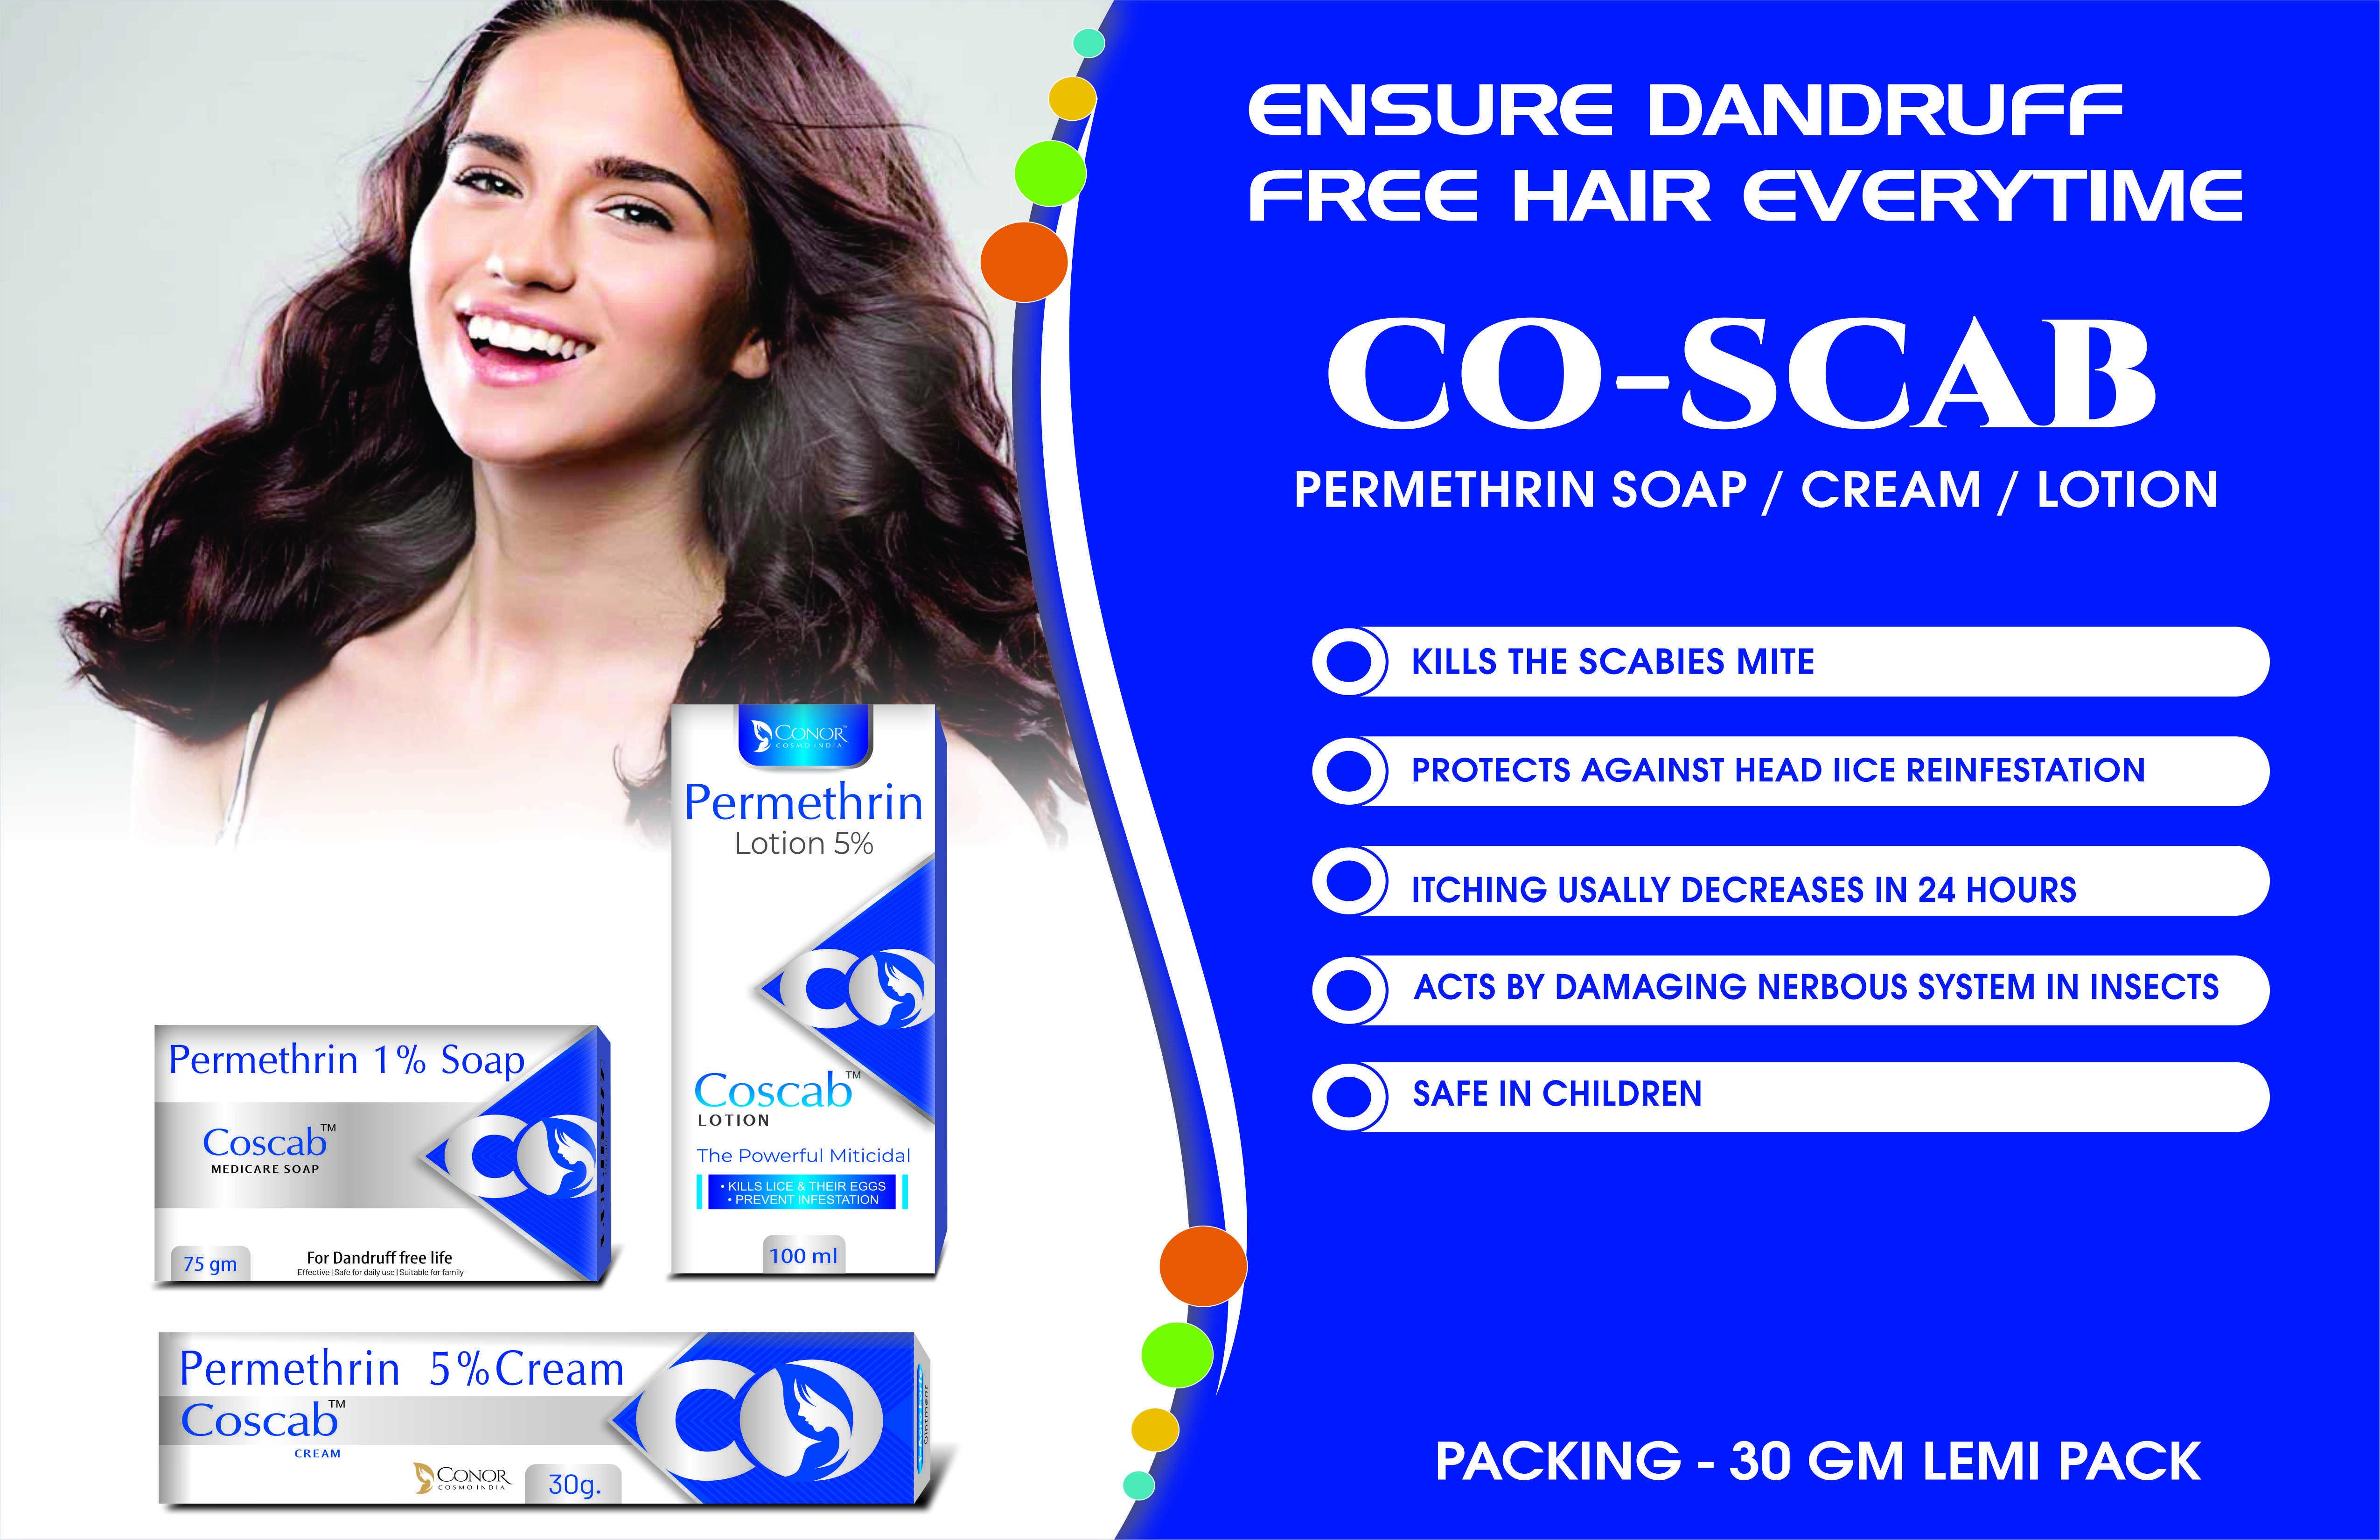 Truworth Co-scab Lotion/Cream